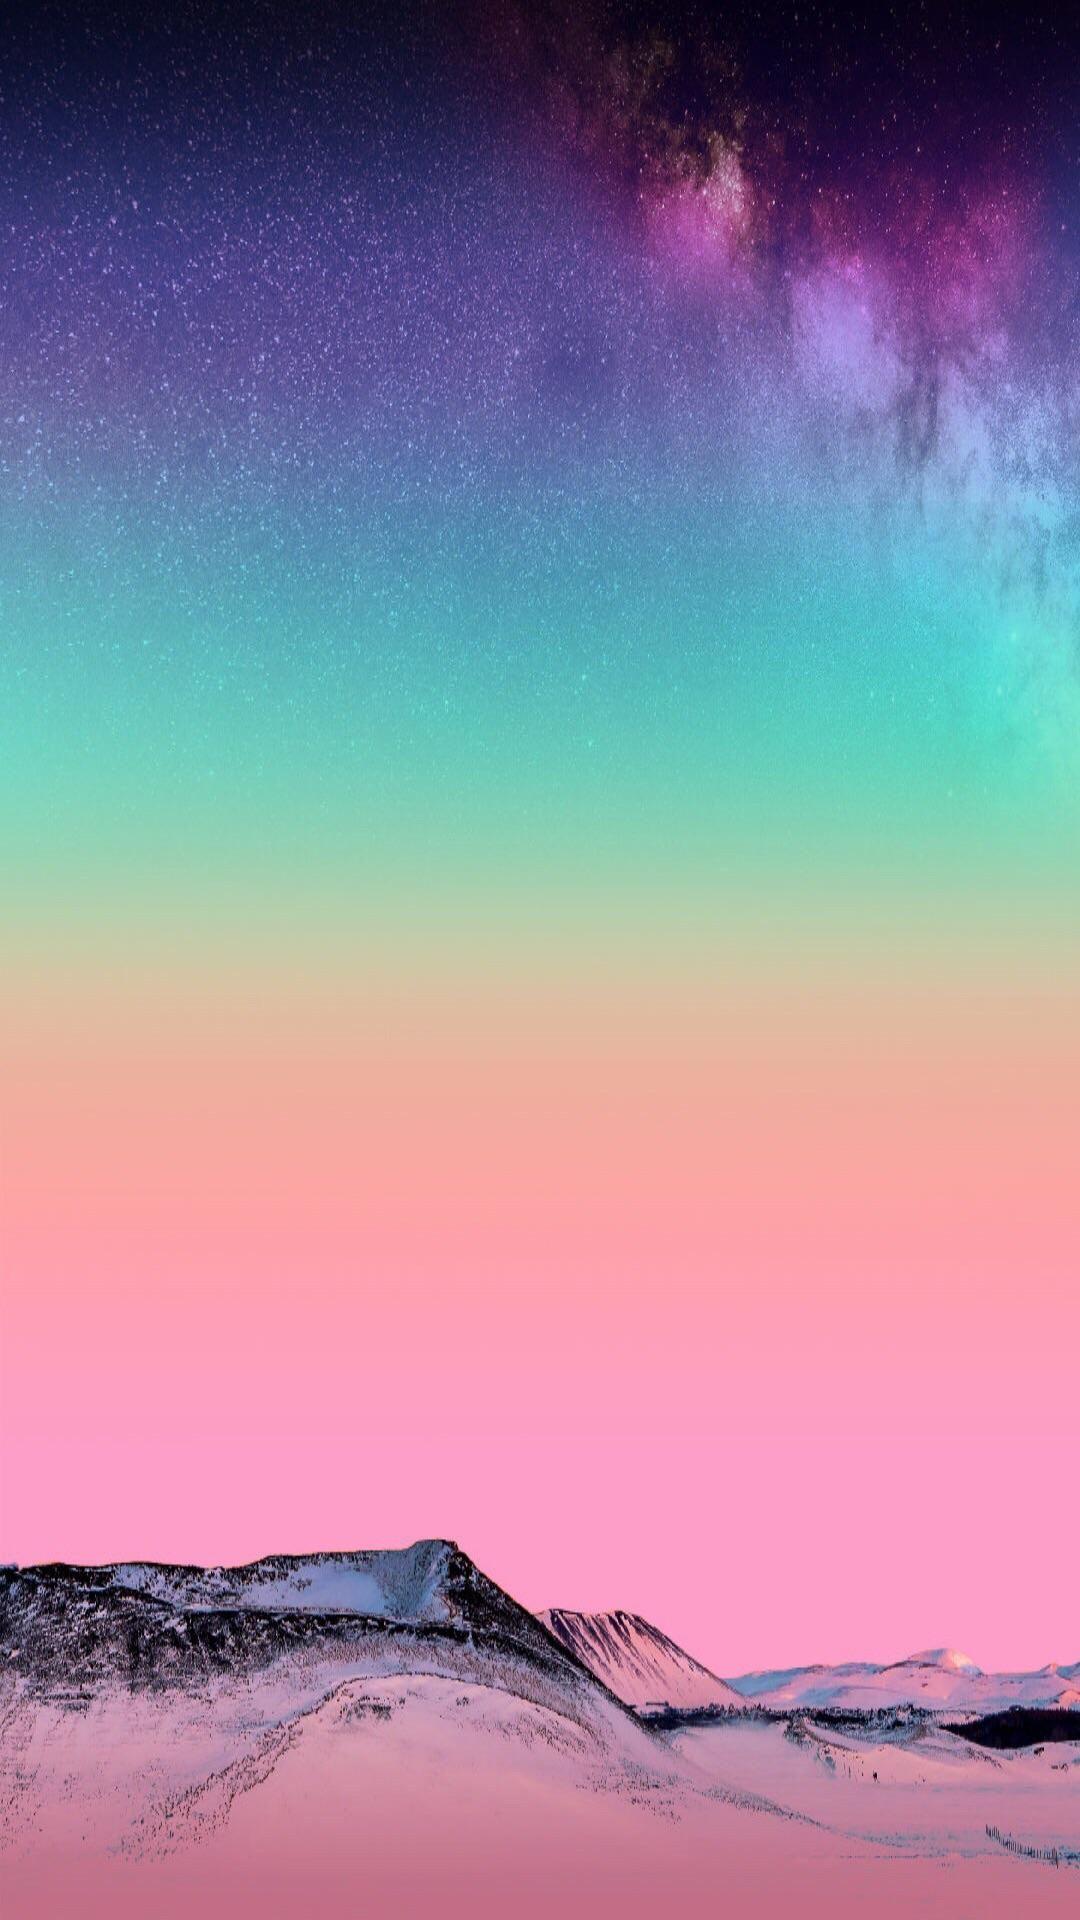 Galaxy M30 Stock Samsung Galaxy Wallpaper Samsung Galaxy Wallpaper Android Iphone Wallpaper Sky